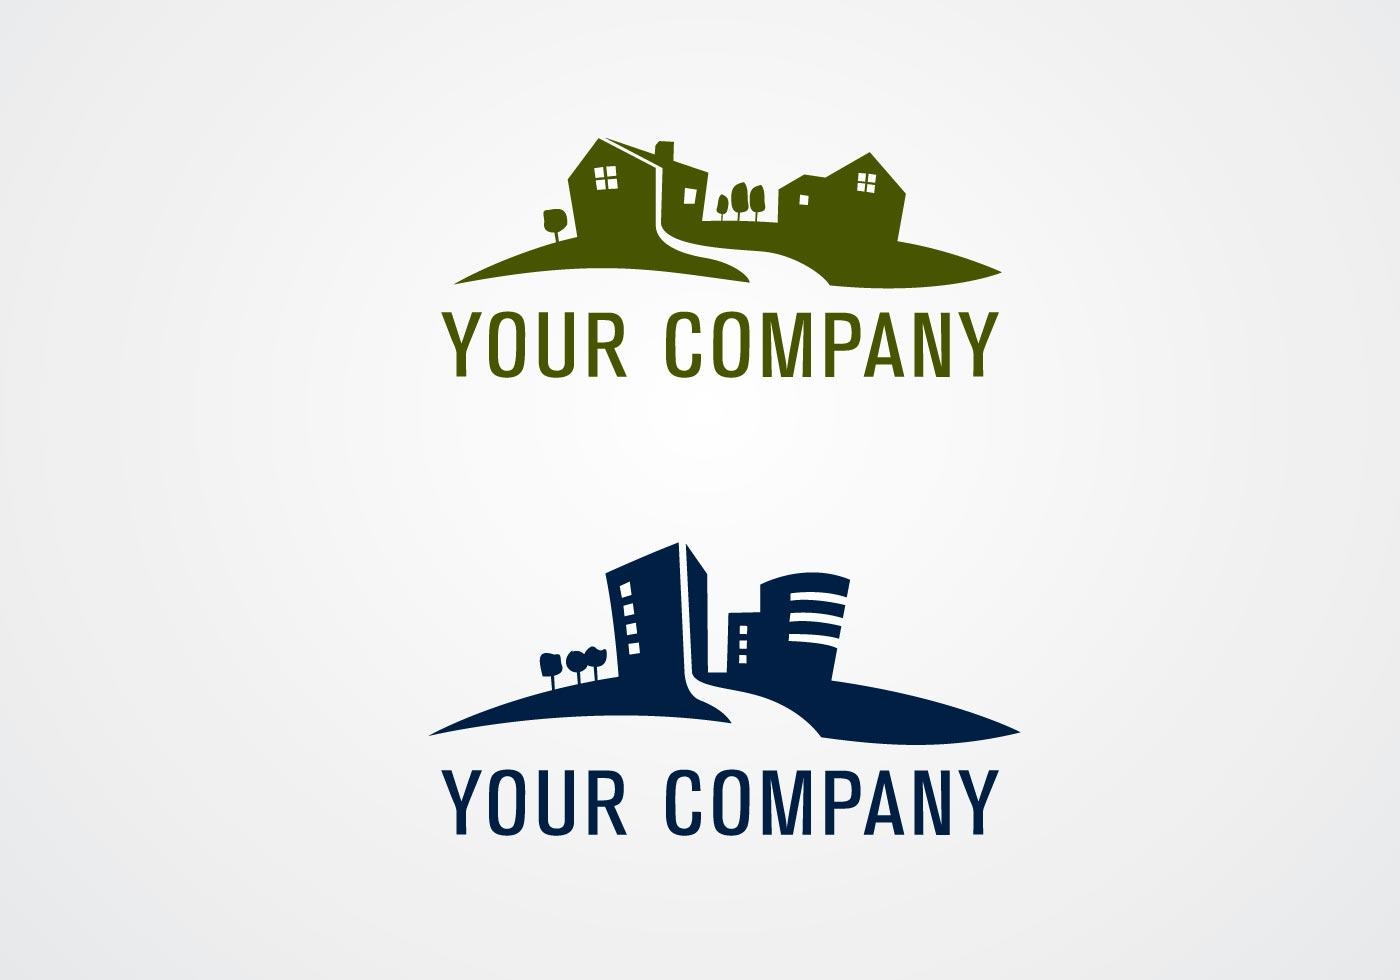 Tile Company Logo Joy Studio Design Gallery Best Design